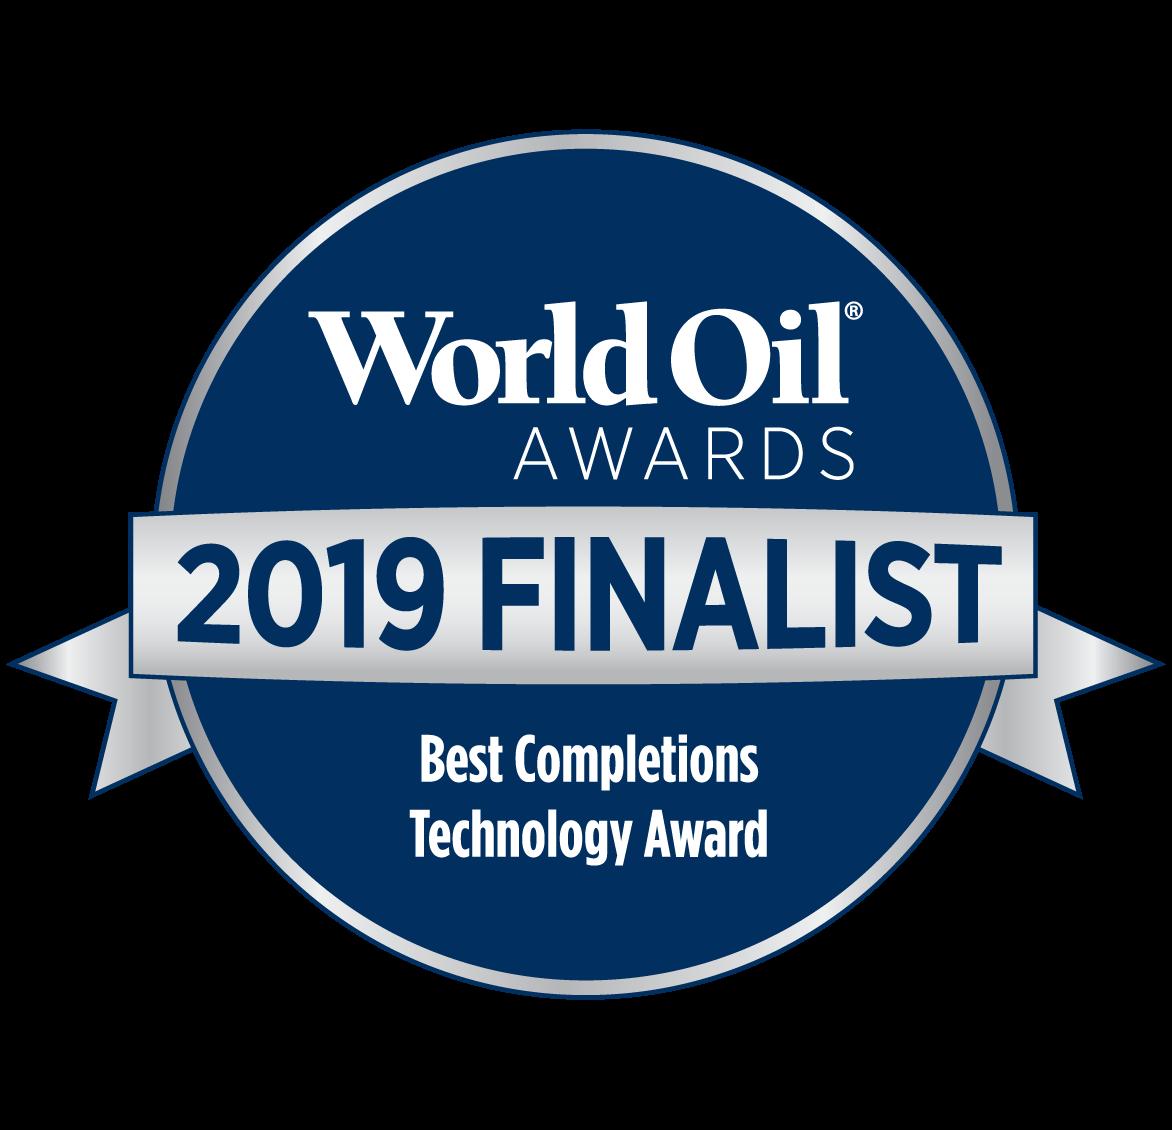 World Oil finalists